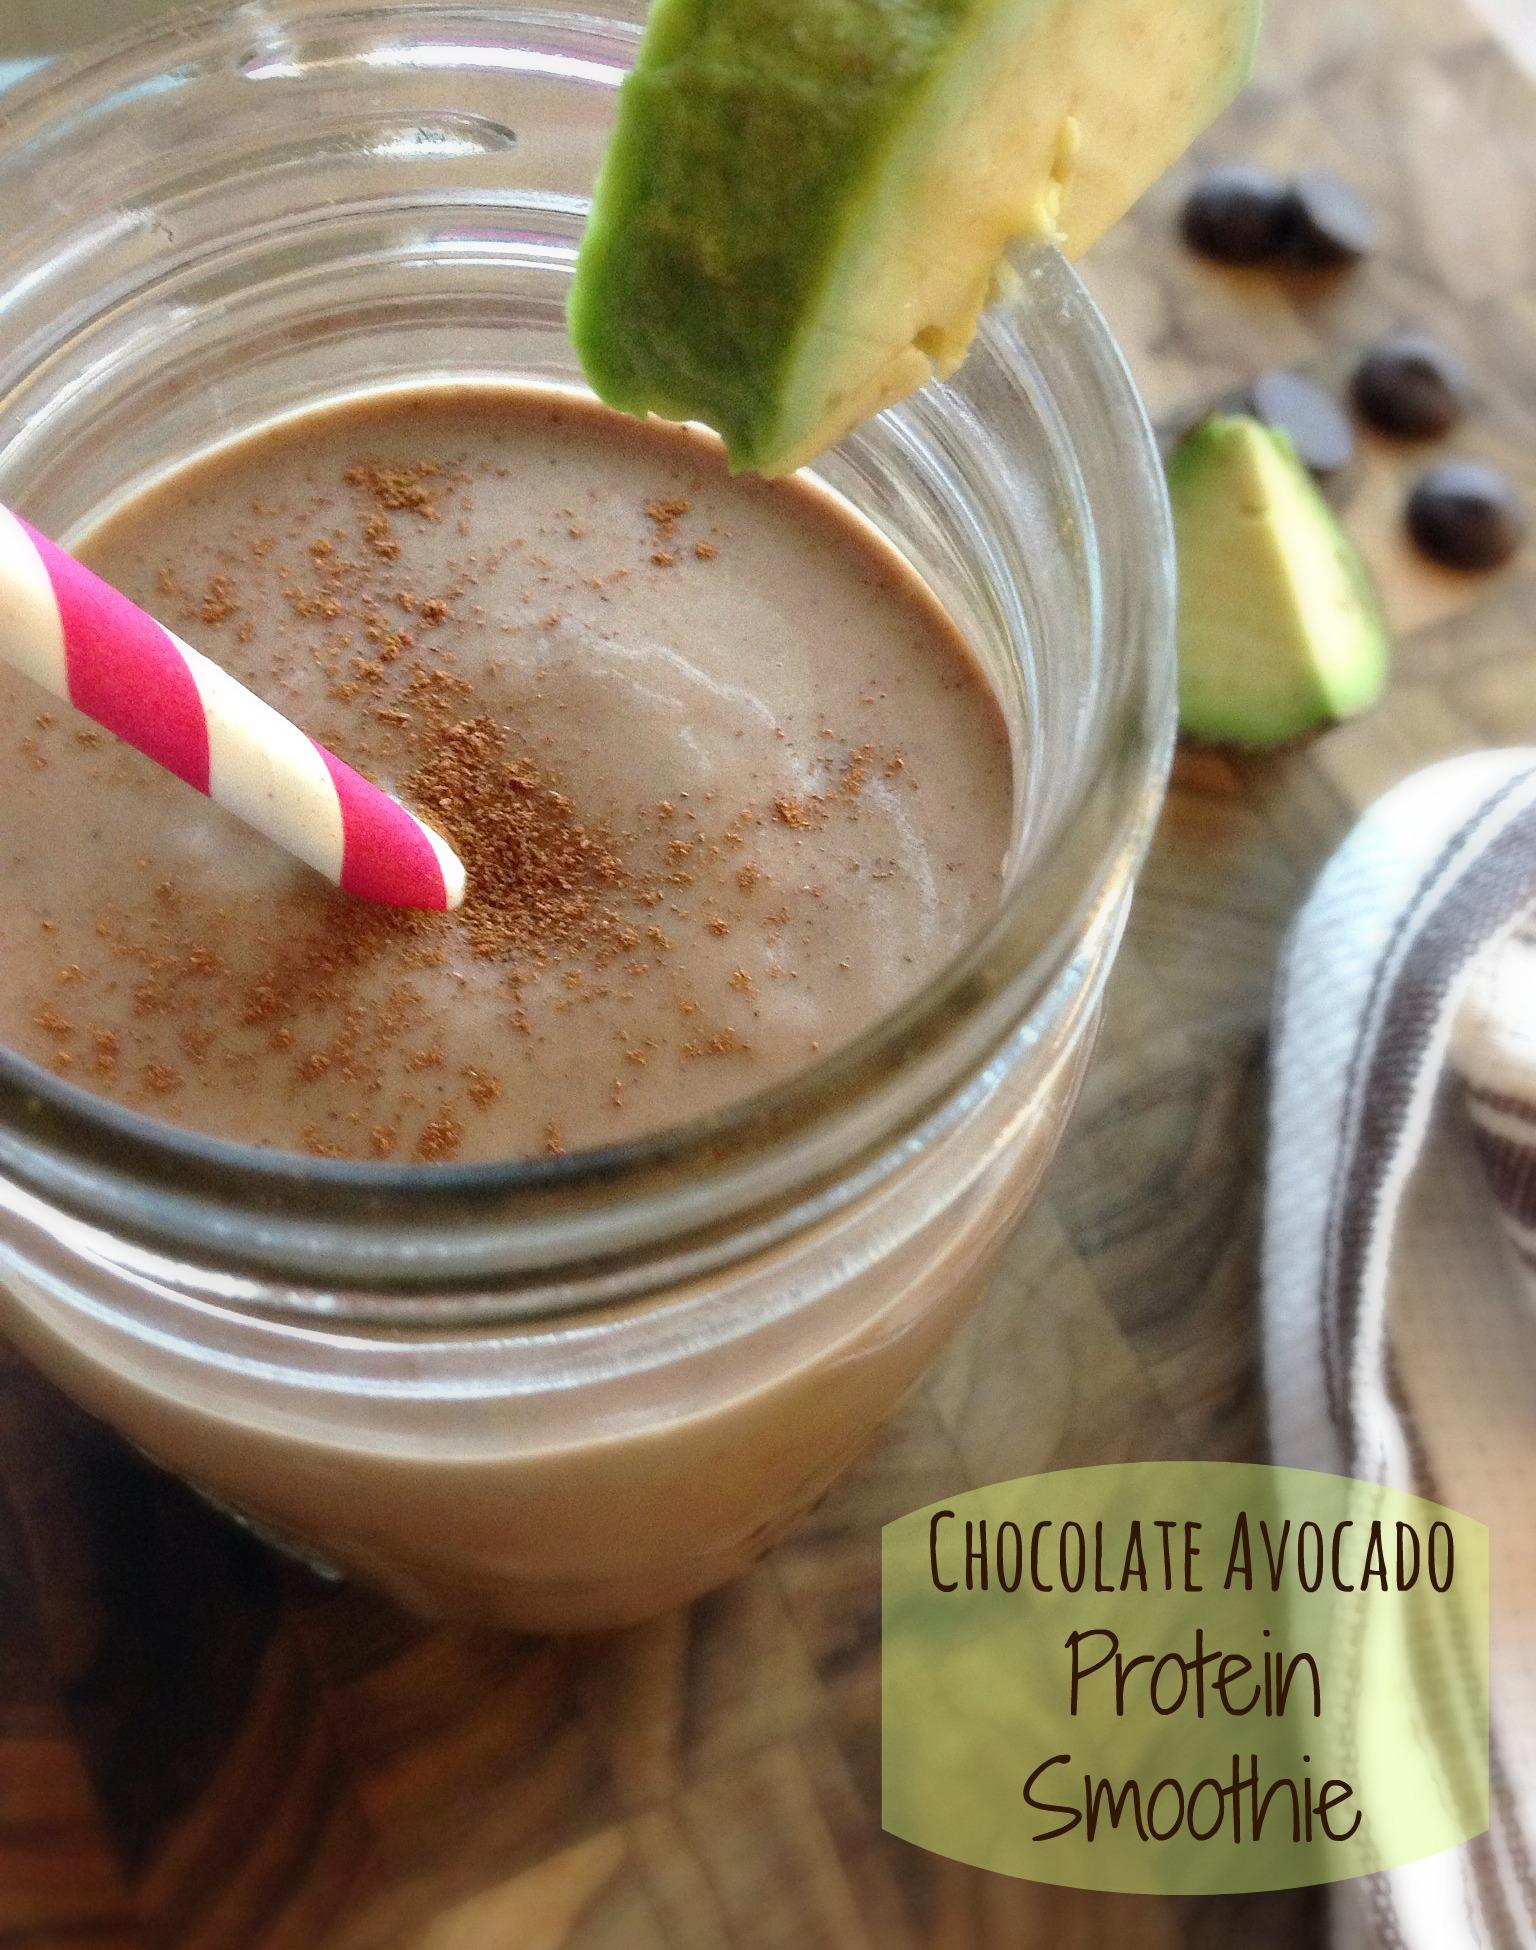 Chocolate Avocado Protein Smoothie